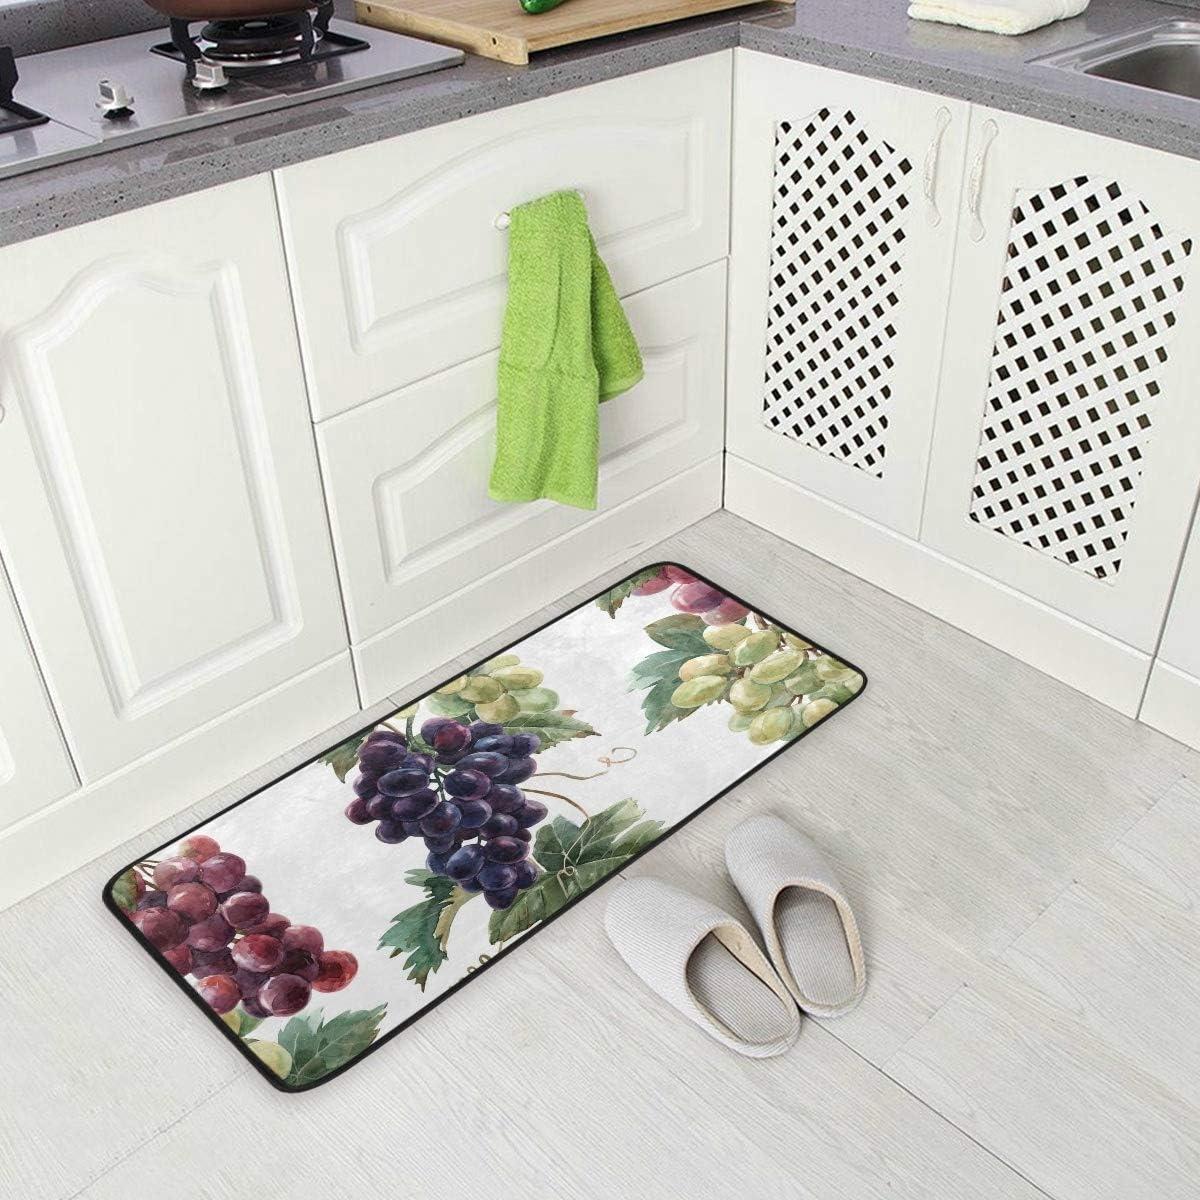 Amazon Com Jereee Watercolor Grapes Non Slip Kitchen Mat Rectangle Polyester Doormat Floor Runner Rug Home Decor 39 X 20